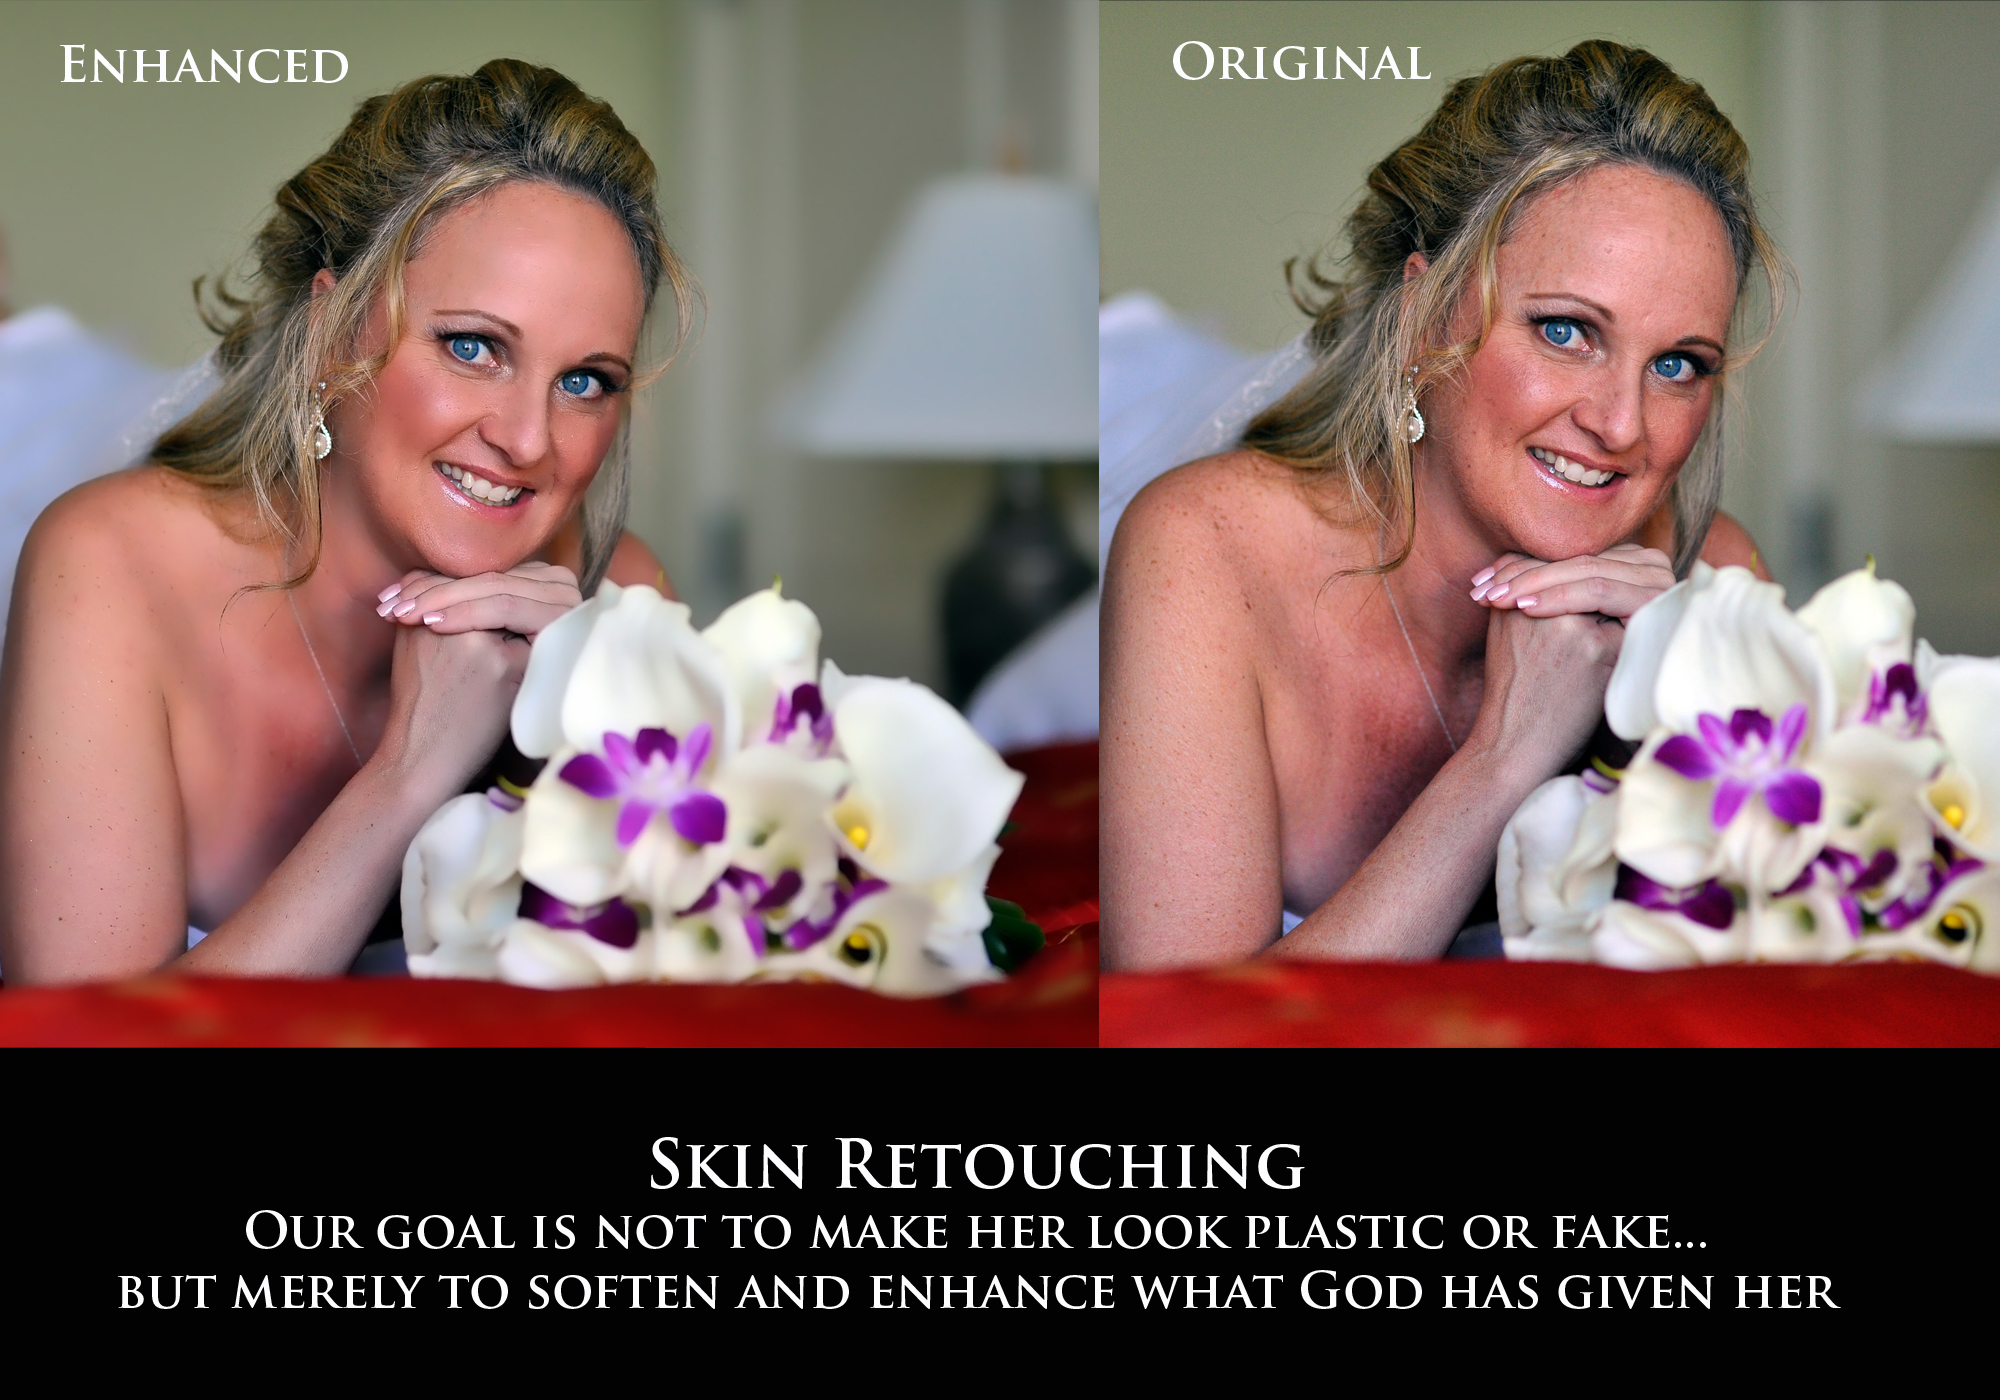 Skin Retouching: BCI's Philosopy